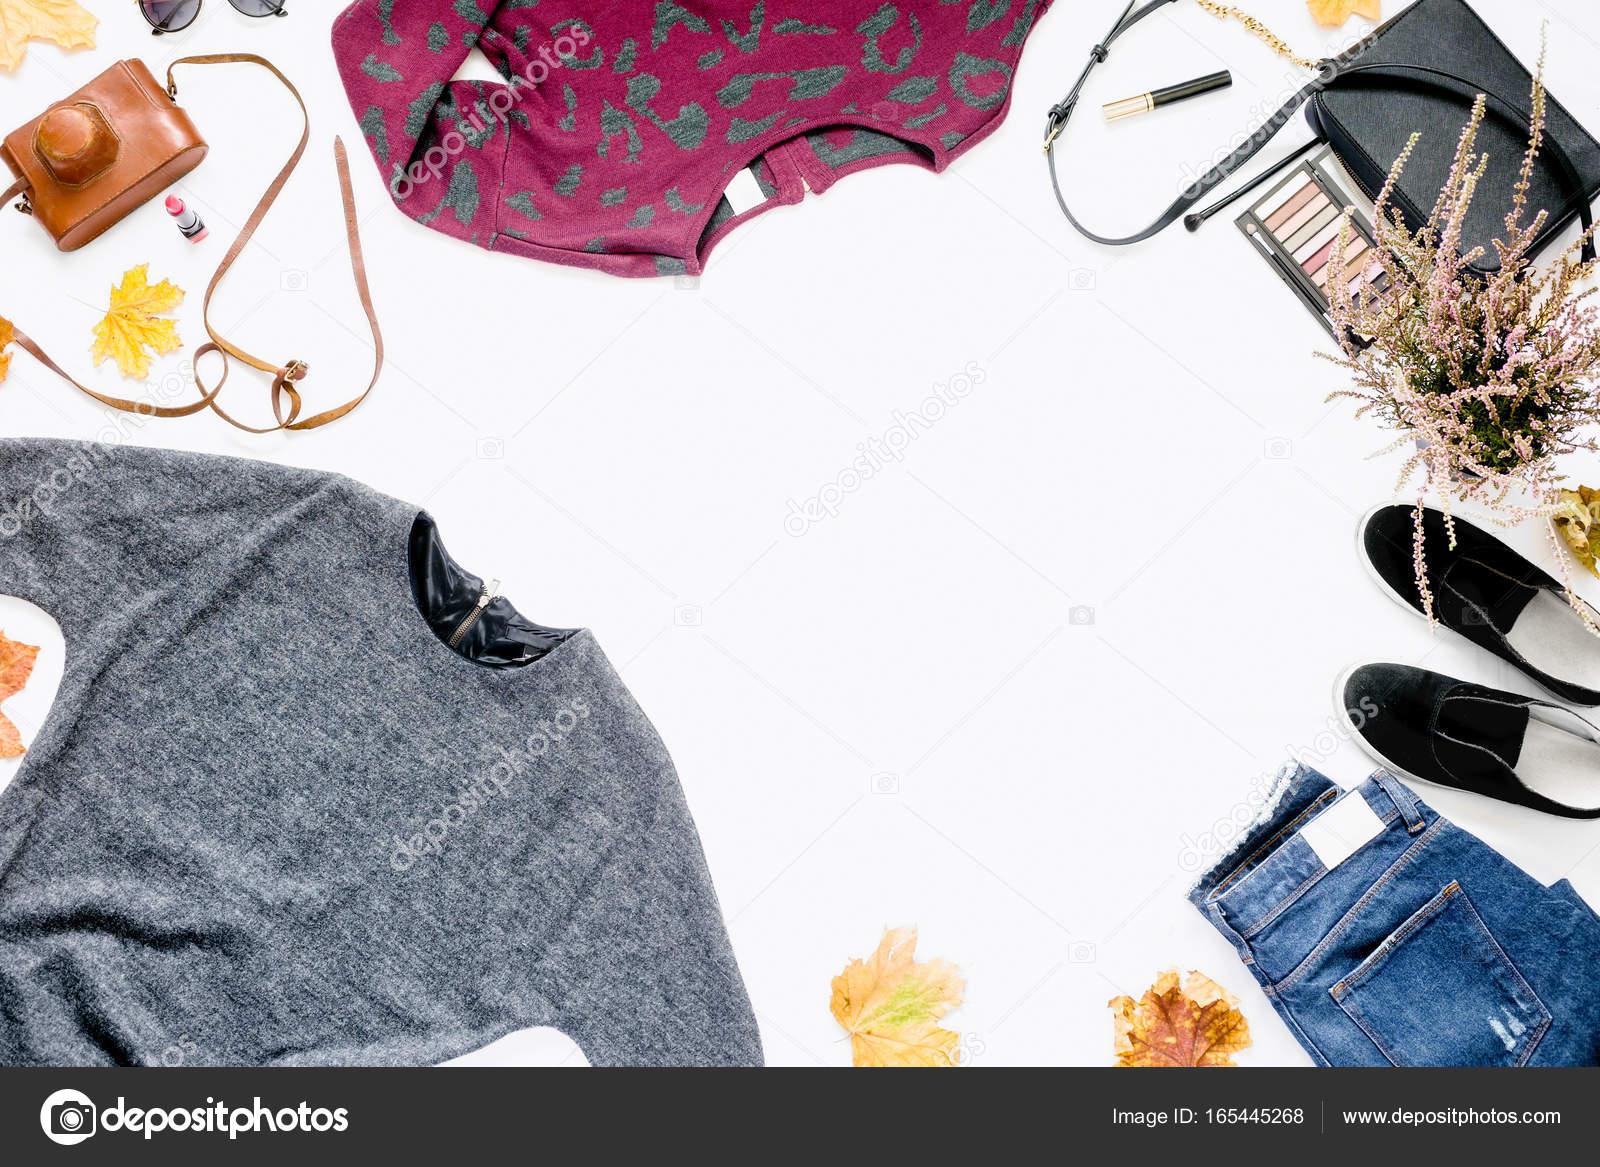 ed7ae7aec00 Γυναικεία ρούχα φθινόπωρο σε άσπρο φόντο. Πλαίσιο της φόρεμα, τζιν,  αθλητικά παπούτσια, τσάντα με καλλυντικά, vintage φωτογραφική μηχανή και τα  φθινοπωρινά ...